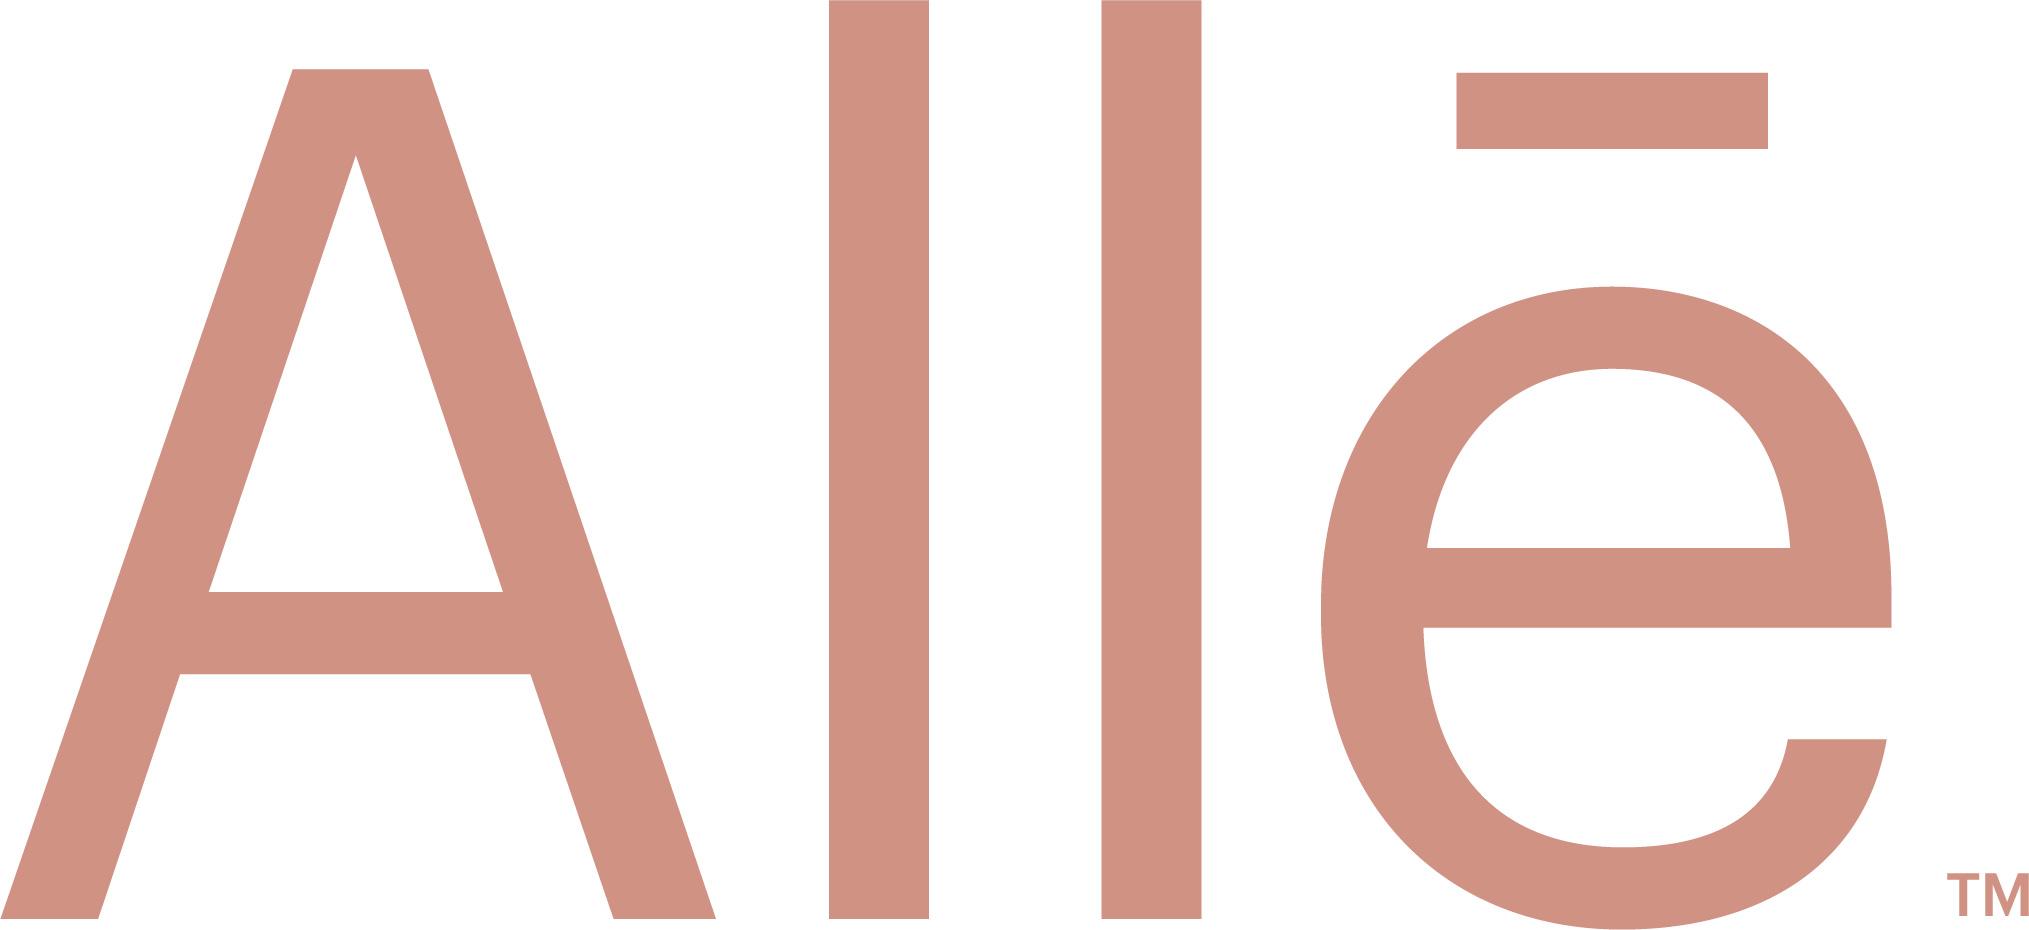 DermWire Exclusive: Meet Allē, Allergan's Upgraded Patient Loyalty Program image